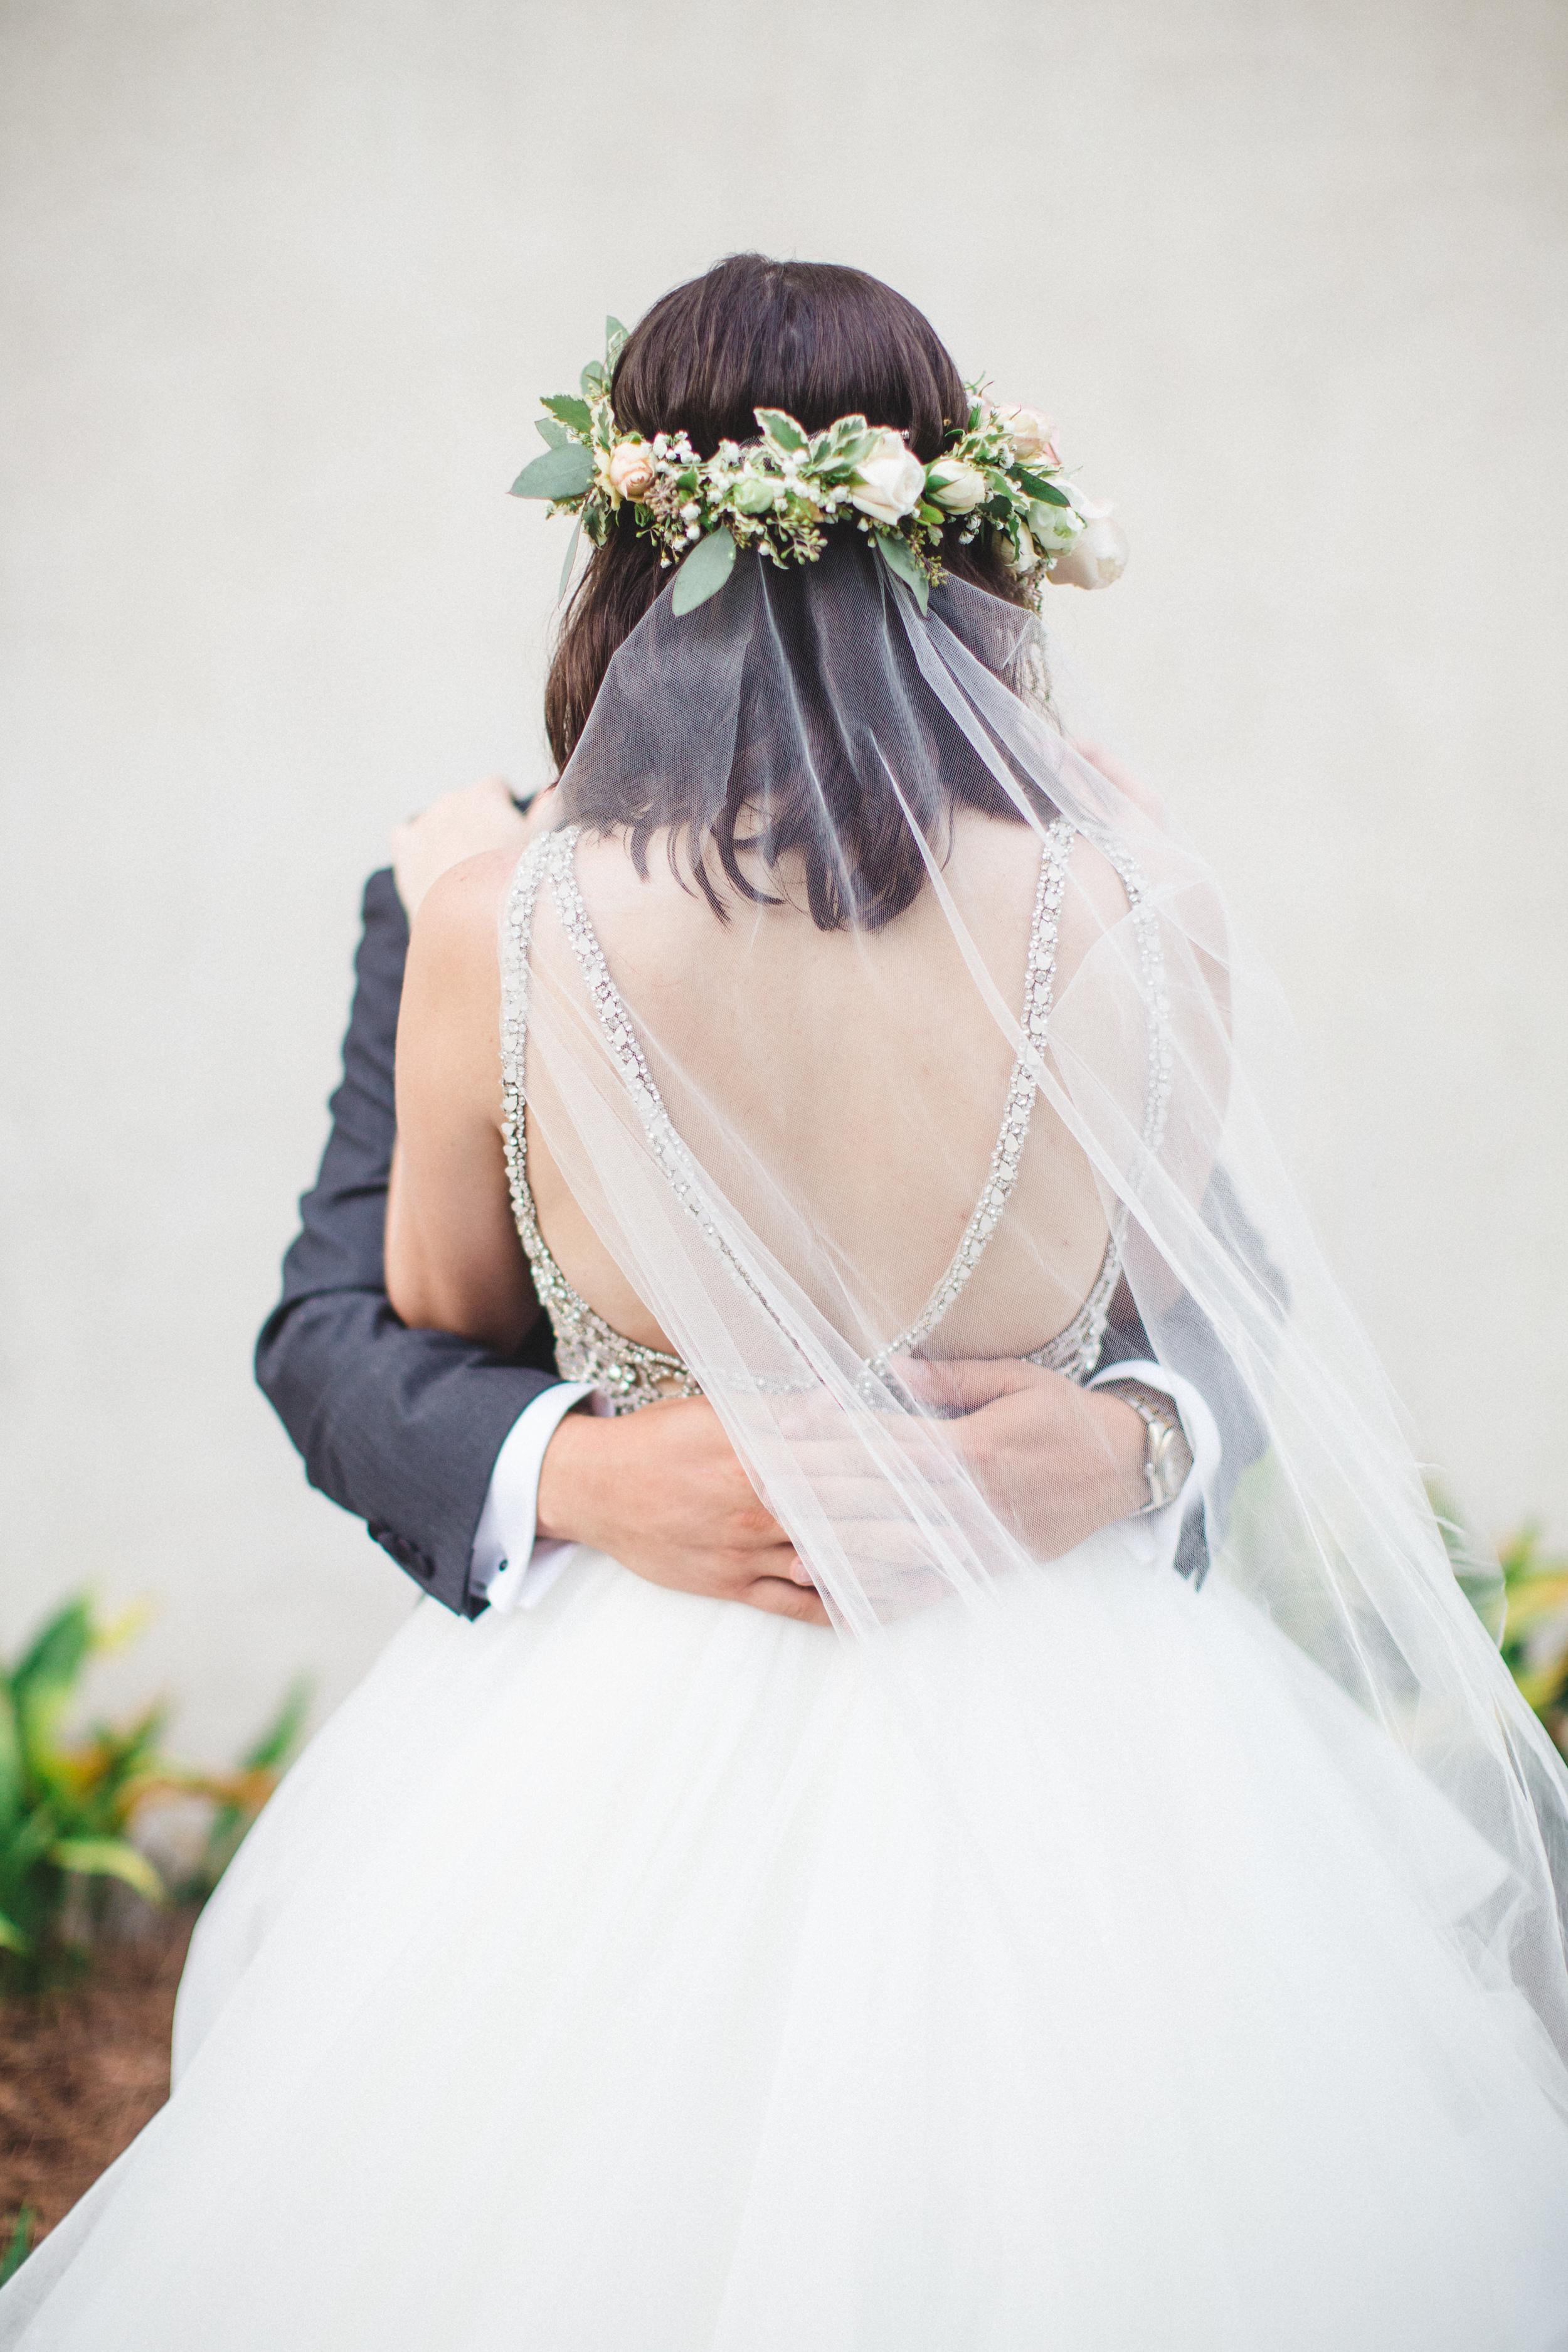 veil-with-flower-crown-ivory-and-beau-bridal-boutique-savannah-wedding-dresses-savannah-bridal-gown-savannah-weddings-savannah-wedding-planner-savannah-weddings-izzy-hudgins-photography.jpg